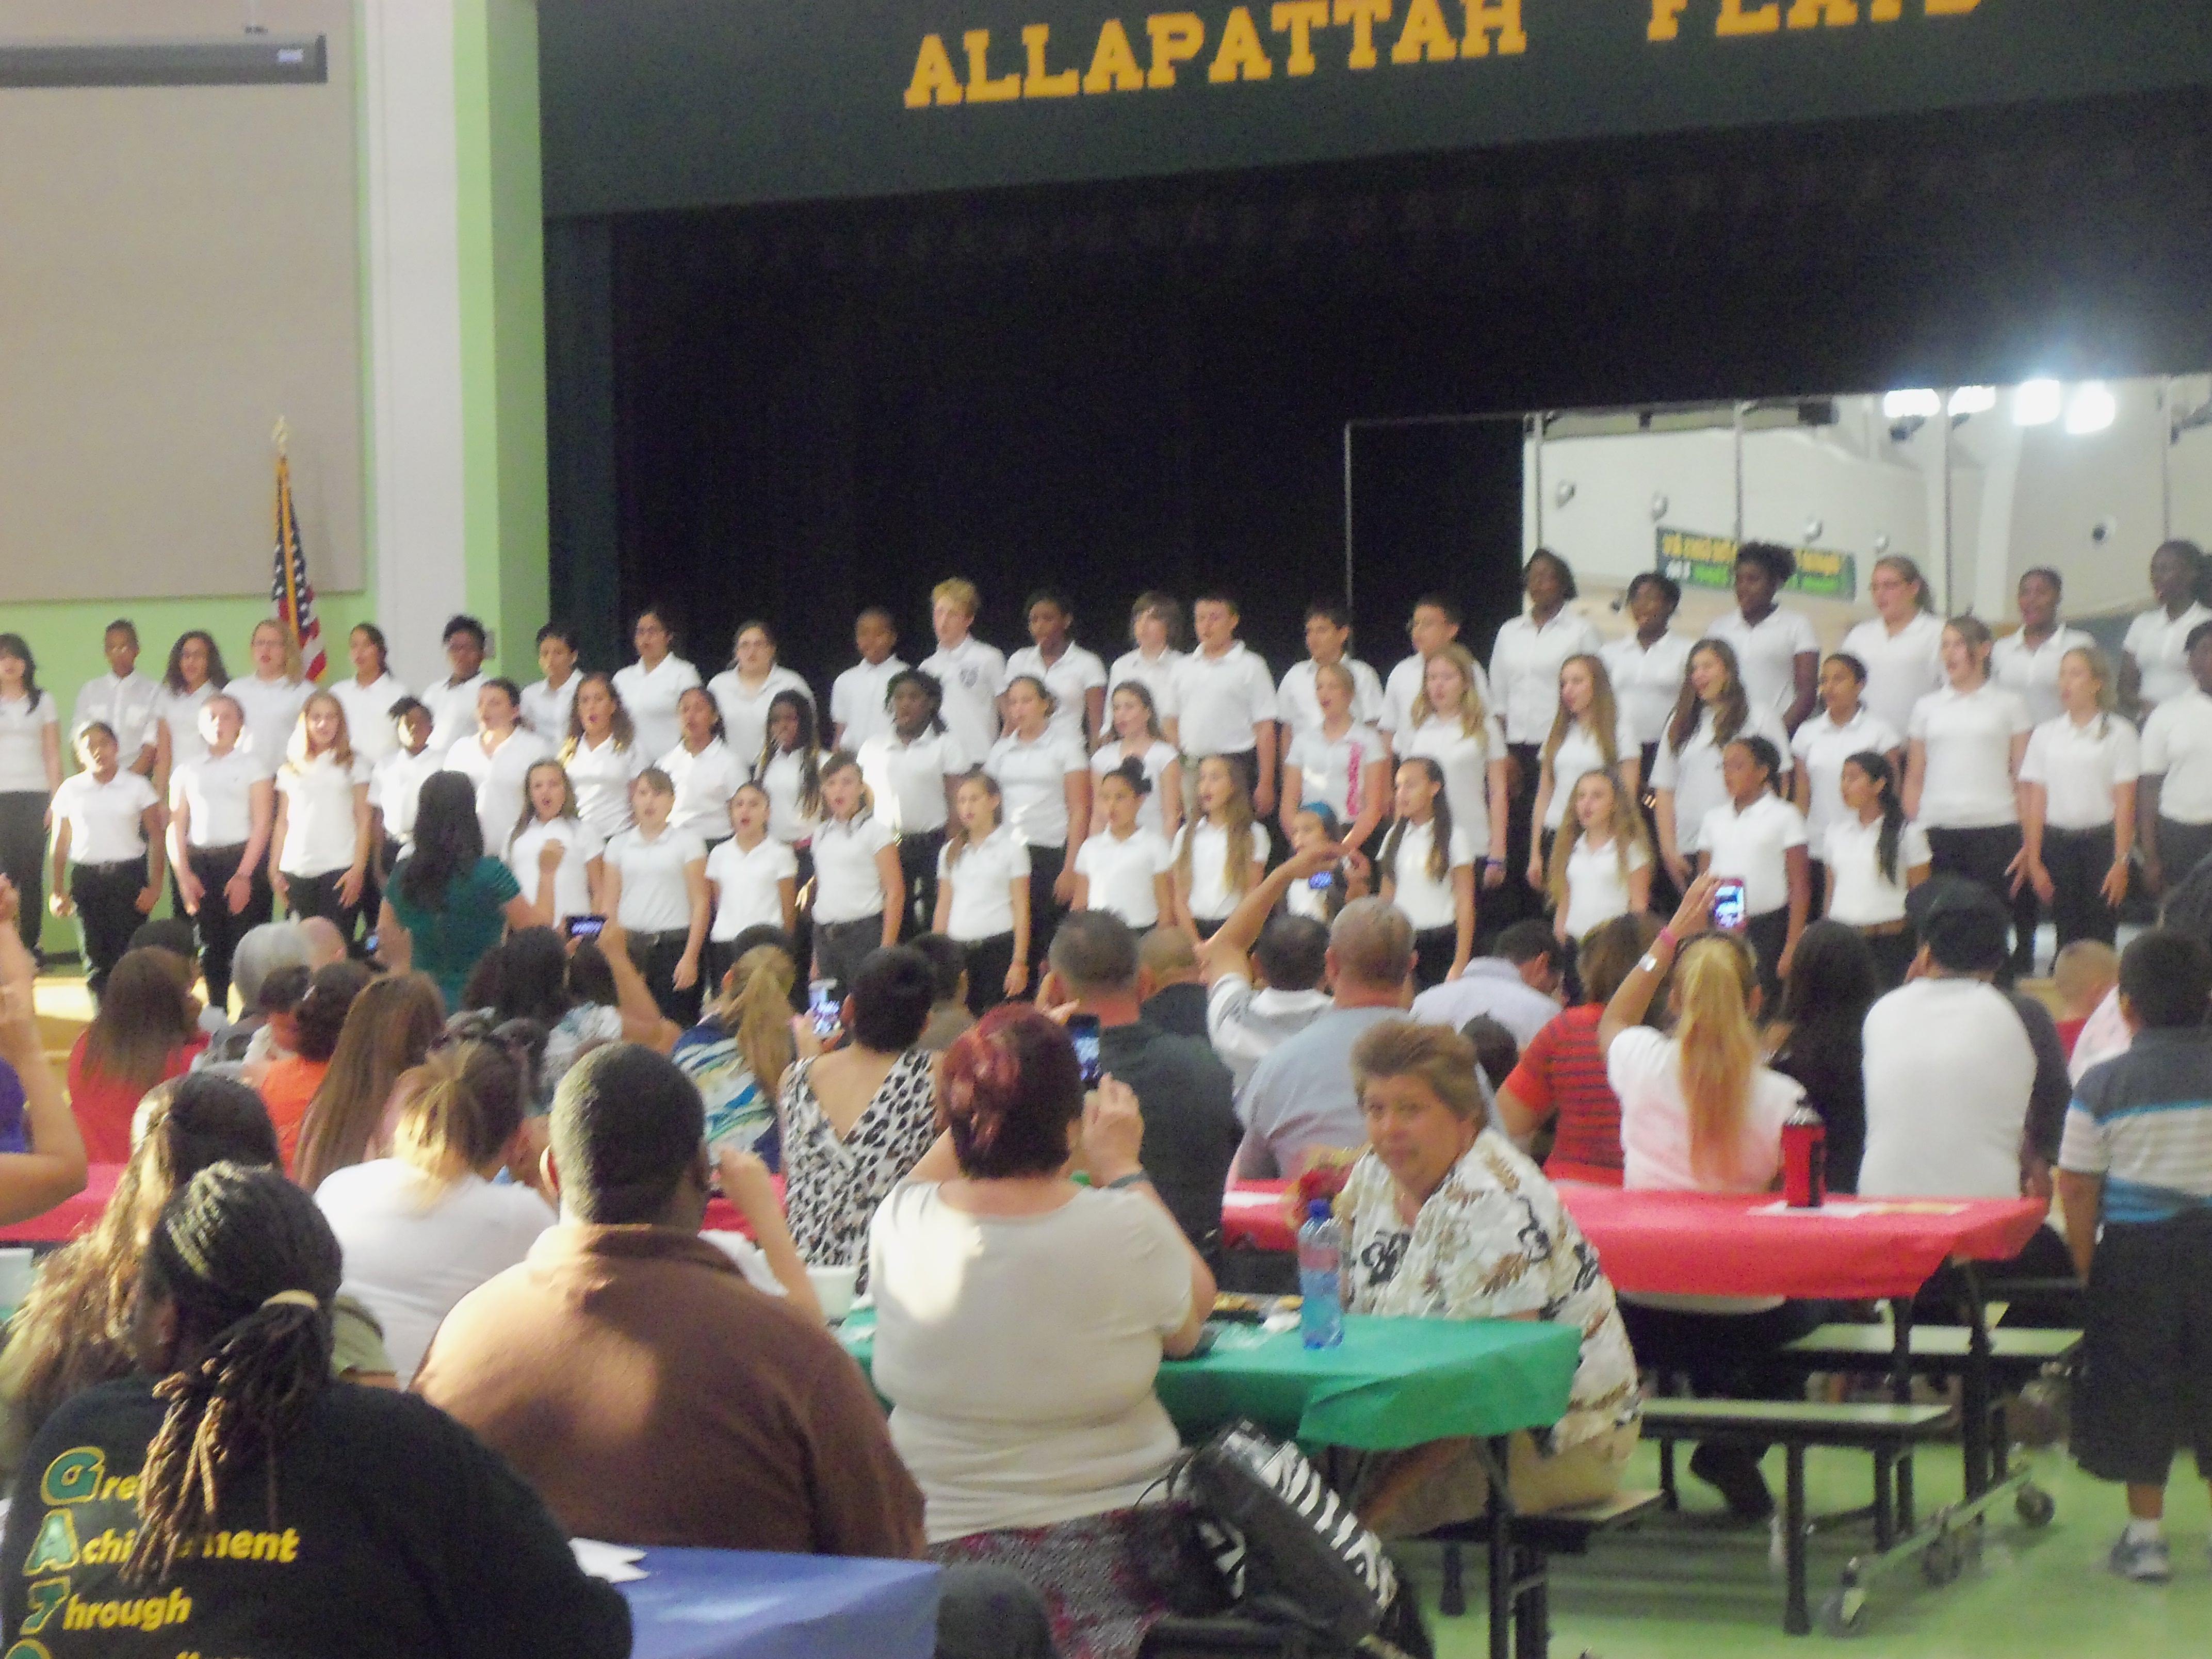 Allapattah Flats celebrates Hispanic heritage